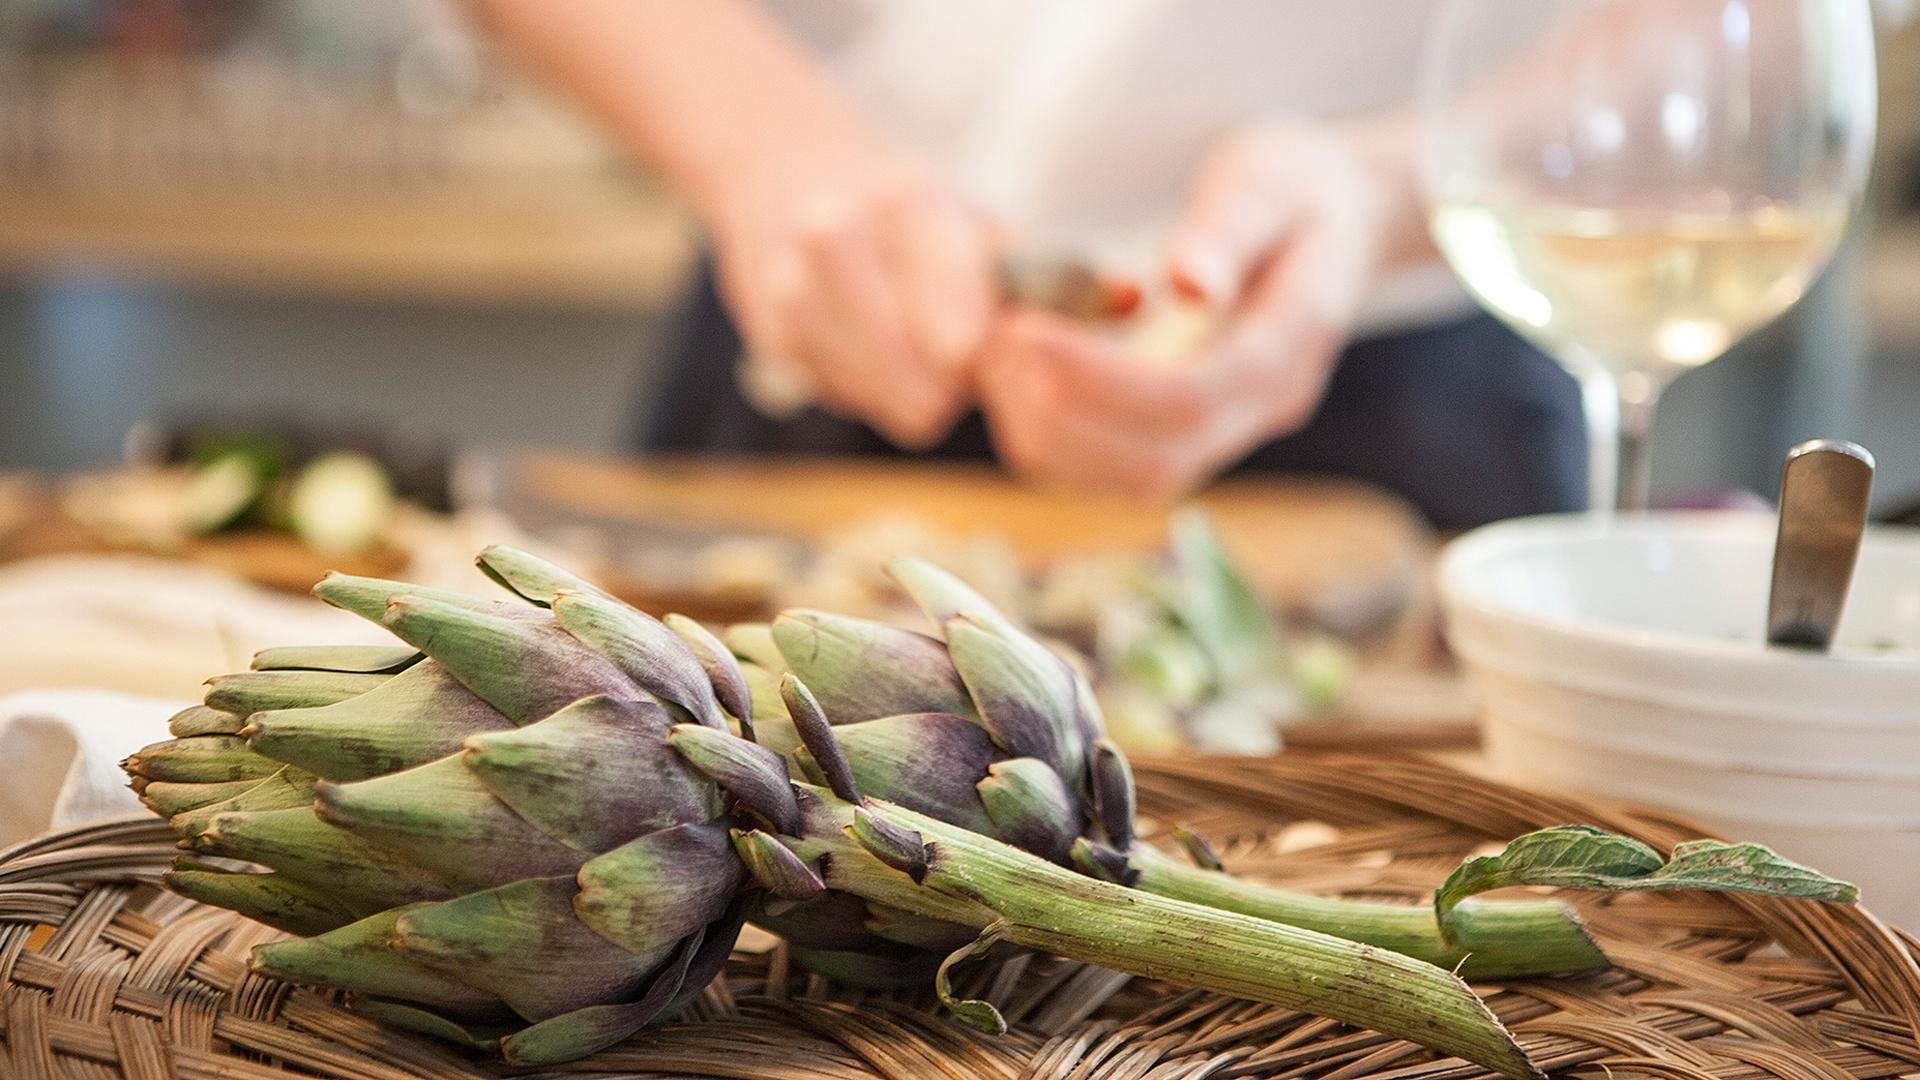 Preparing-artichoke-hearts-for-a-salad-in-Greece-Foodadit